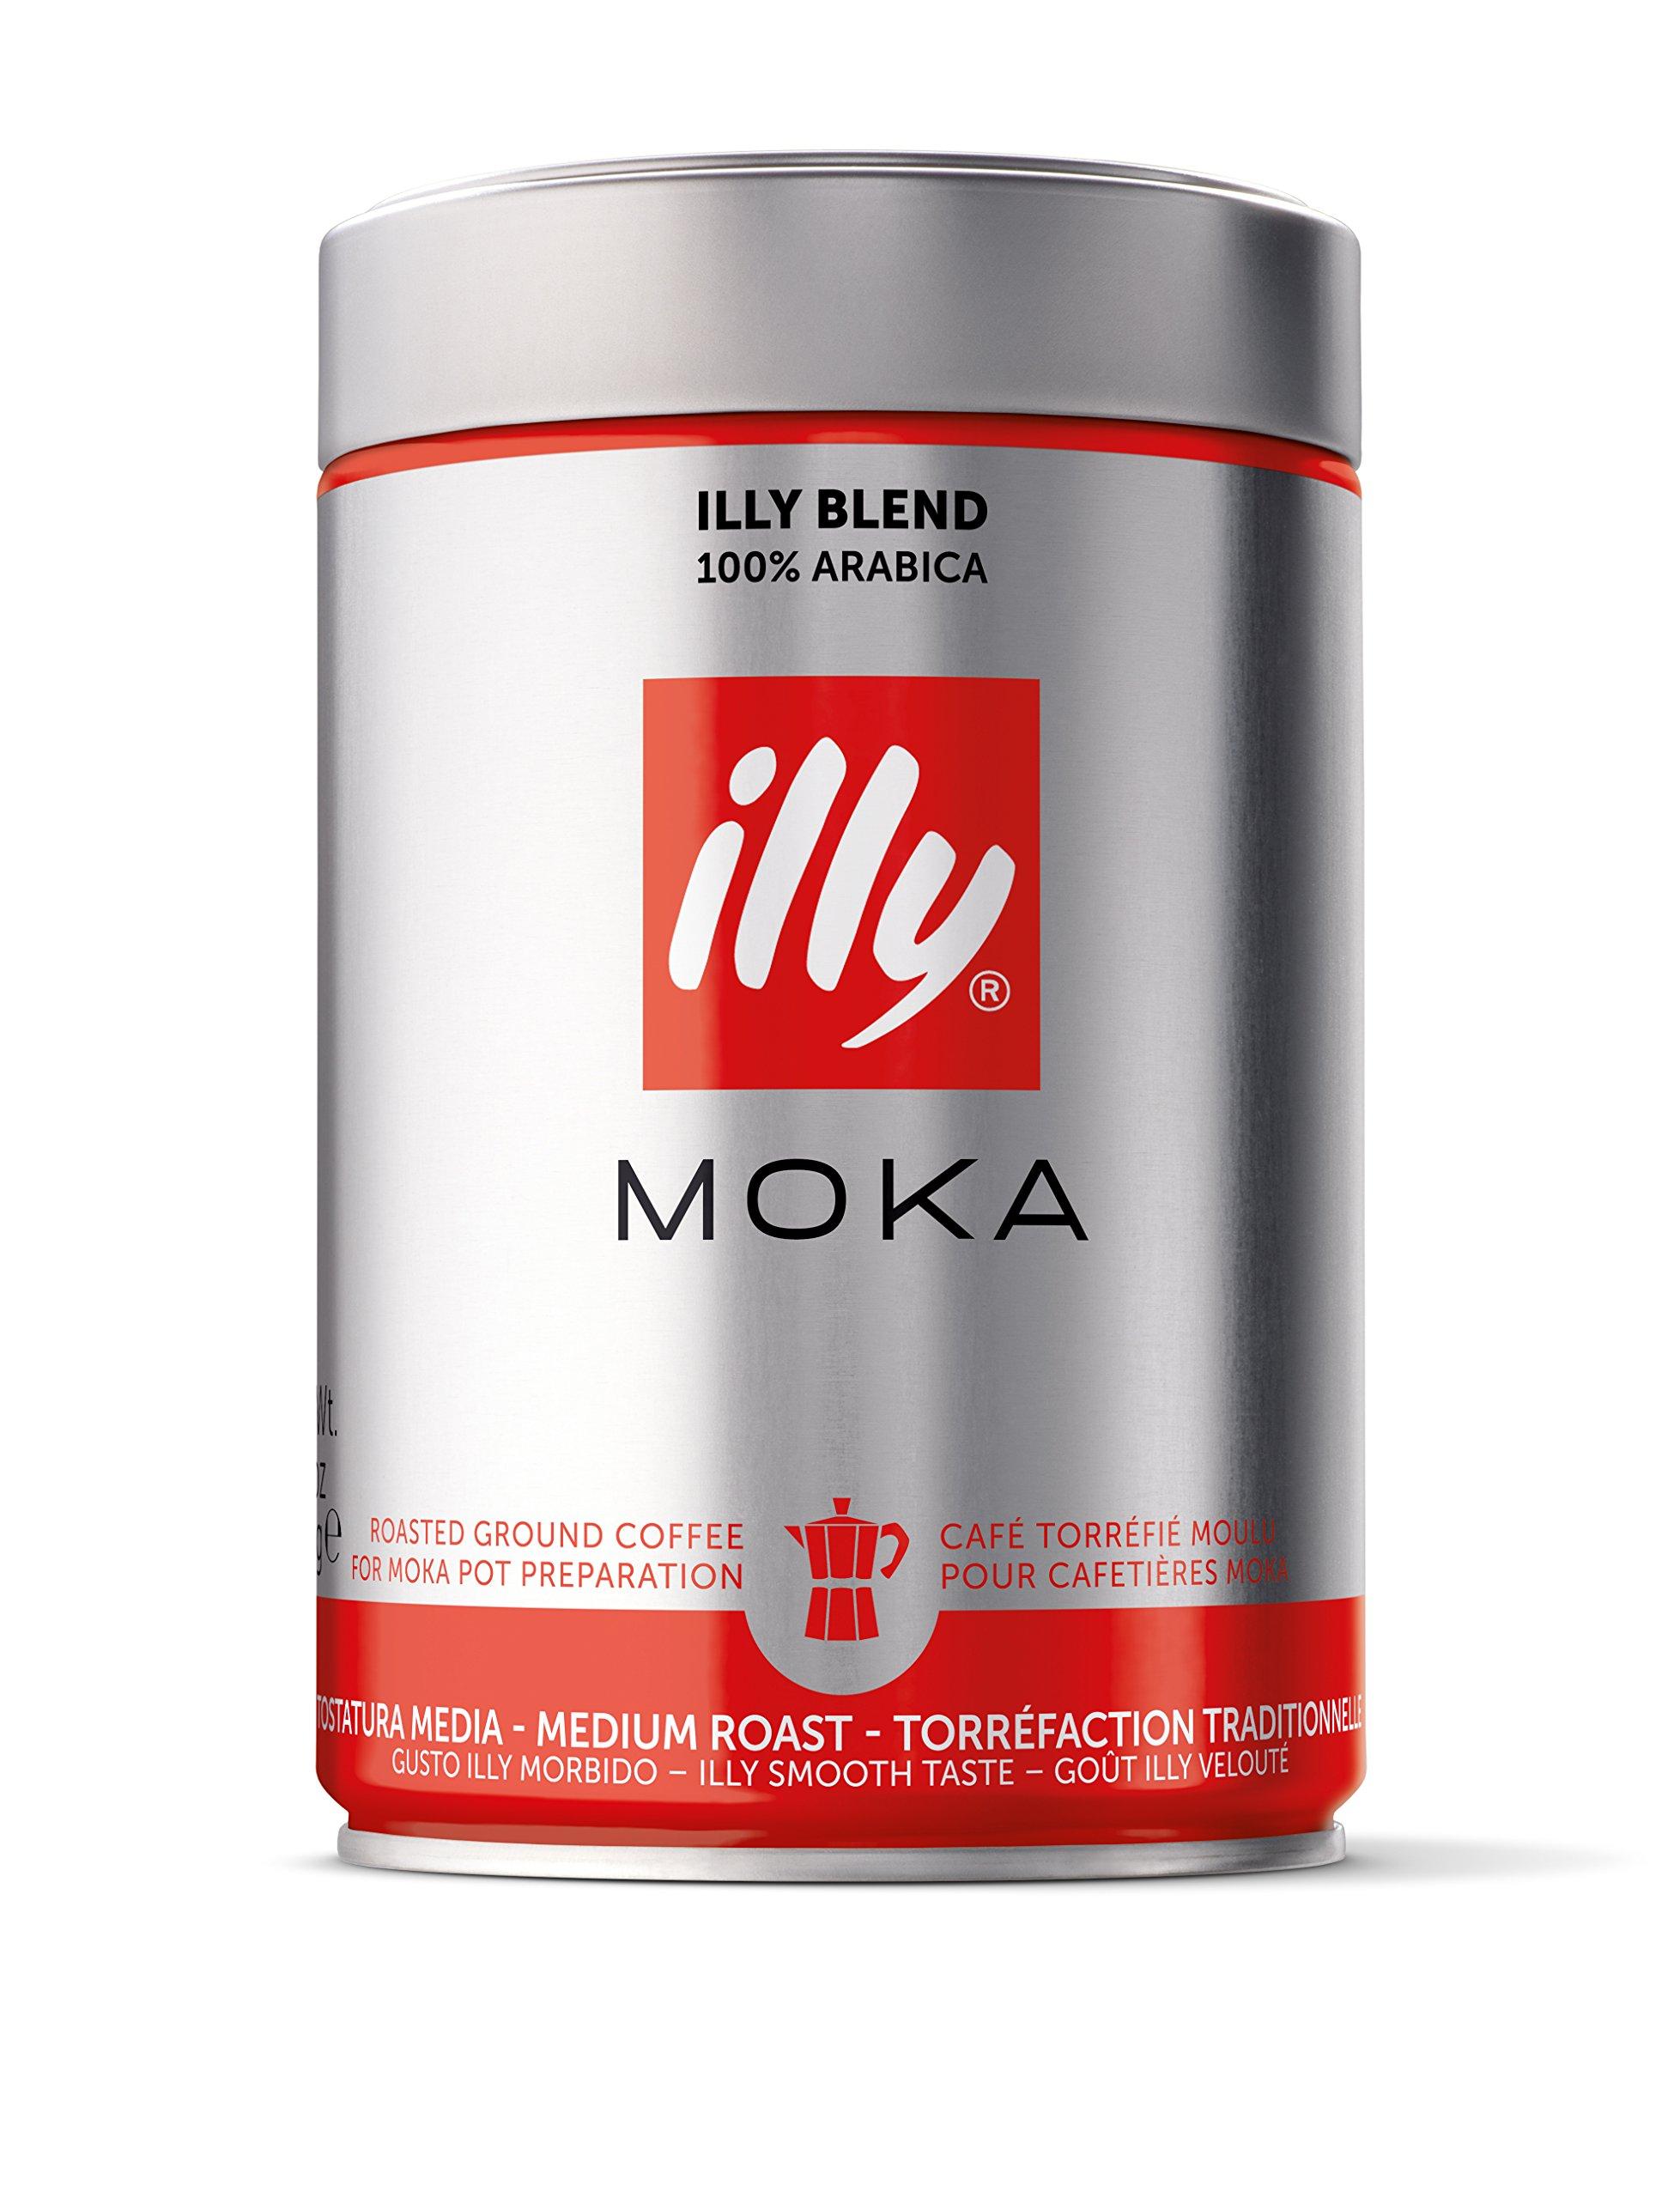 illy Coffee, Moka Ground, Medium Roast, 100% Arabica Bean Signature Italian Blend, Premium Gourmet Roasted Coffee, Pressurized Fresh 8.8 Ounce Tin, Stovetop Moka Pot Preparations.